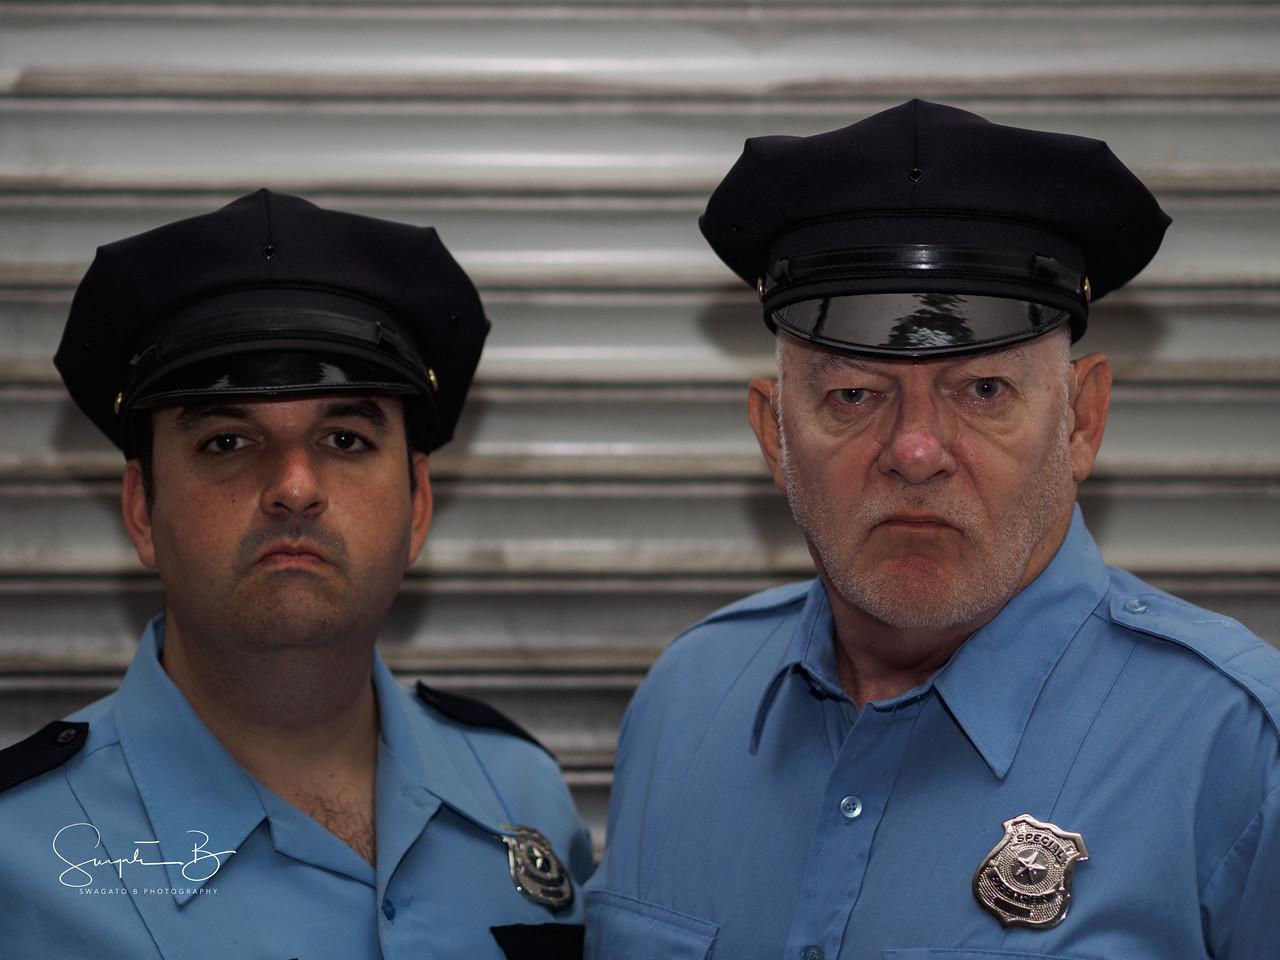 The Police Brotherhood